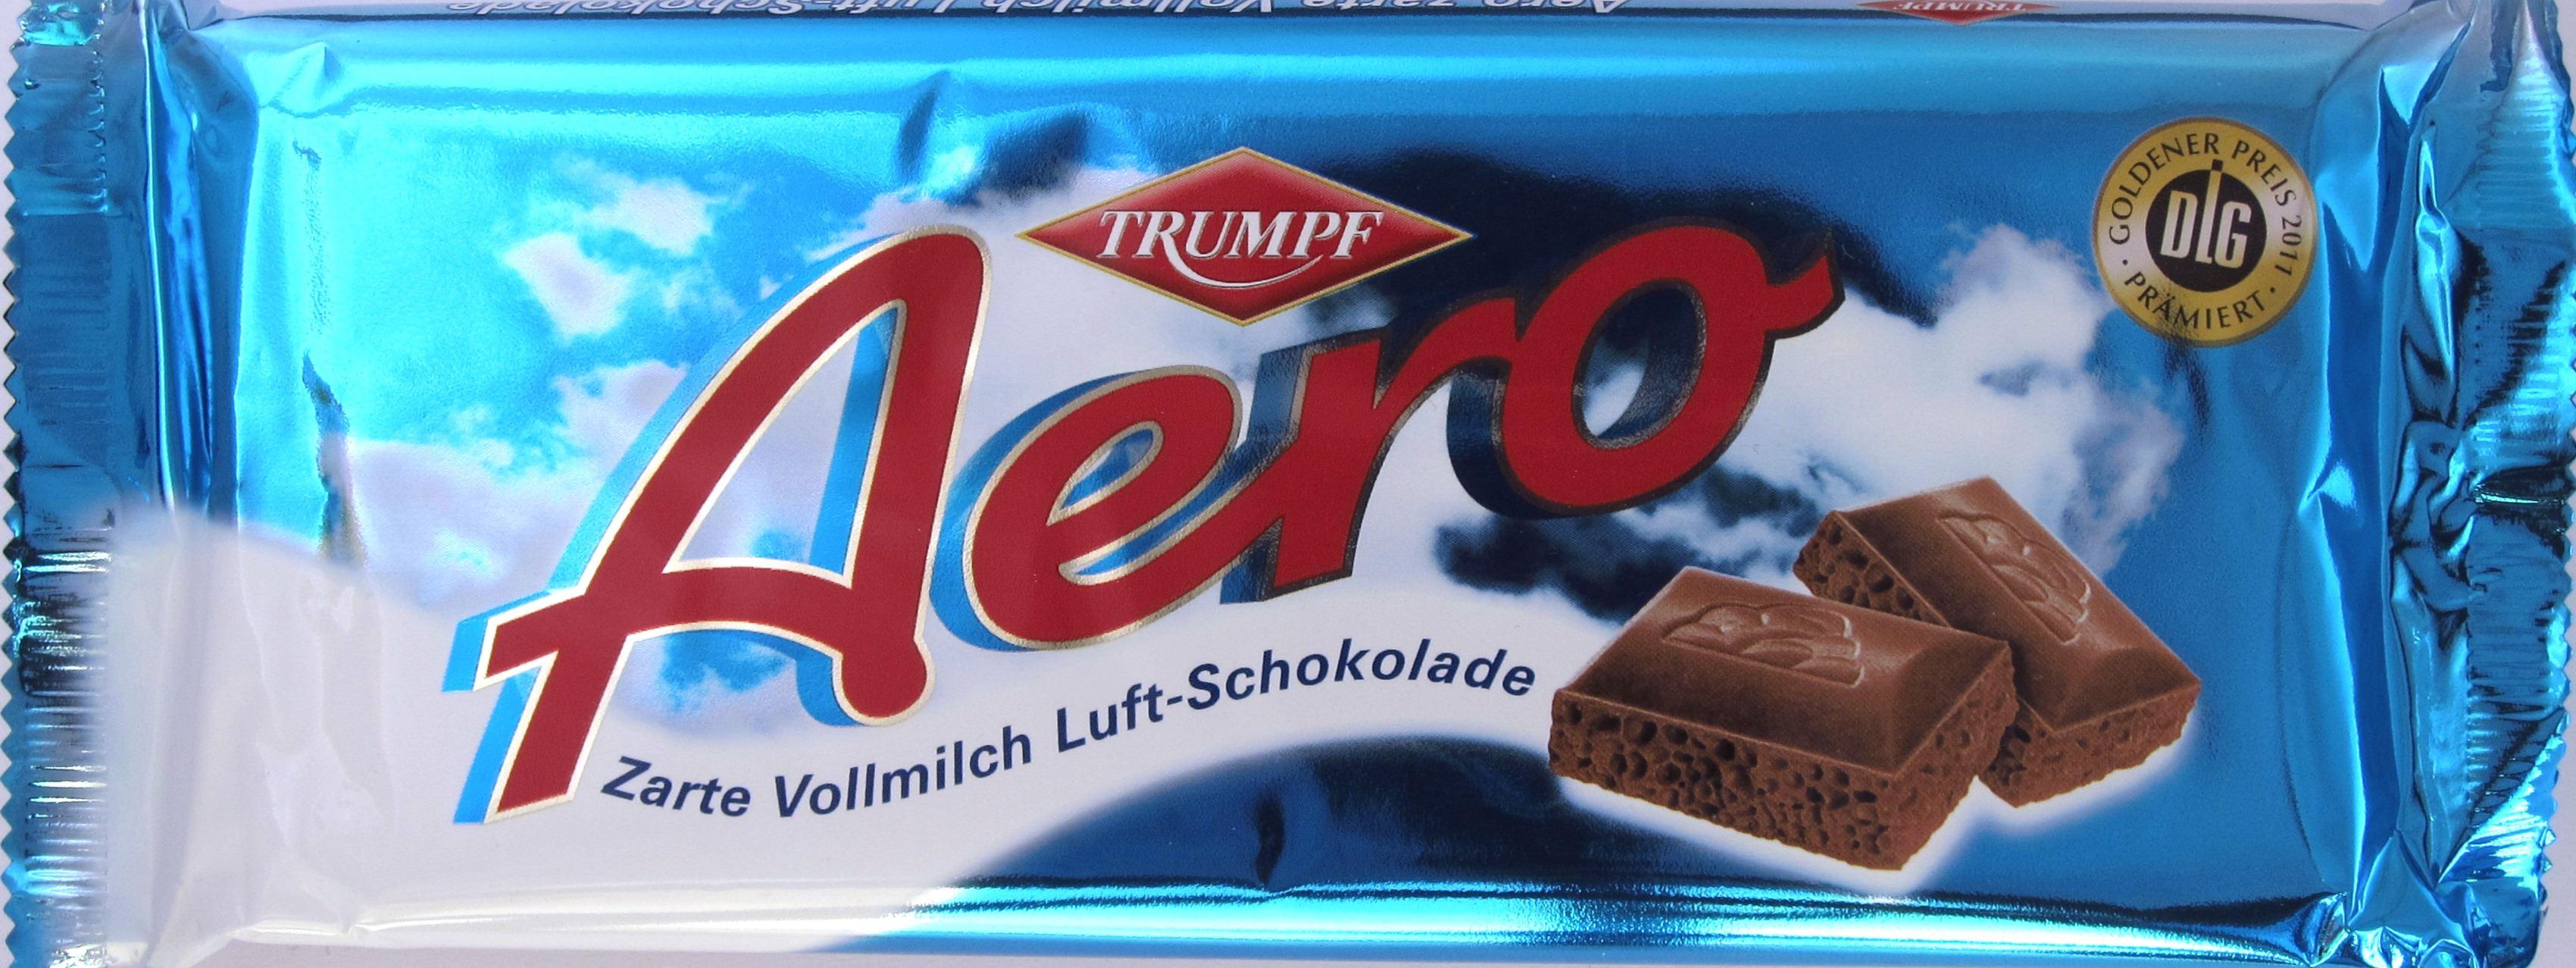 Vorderseite Trumpf Aero Vollmilch